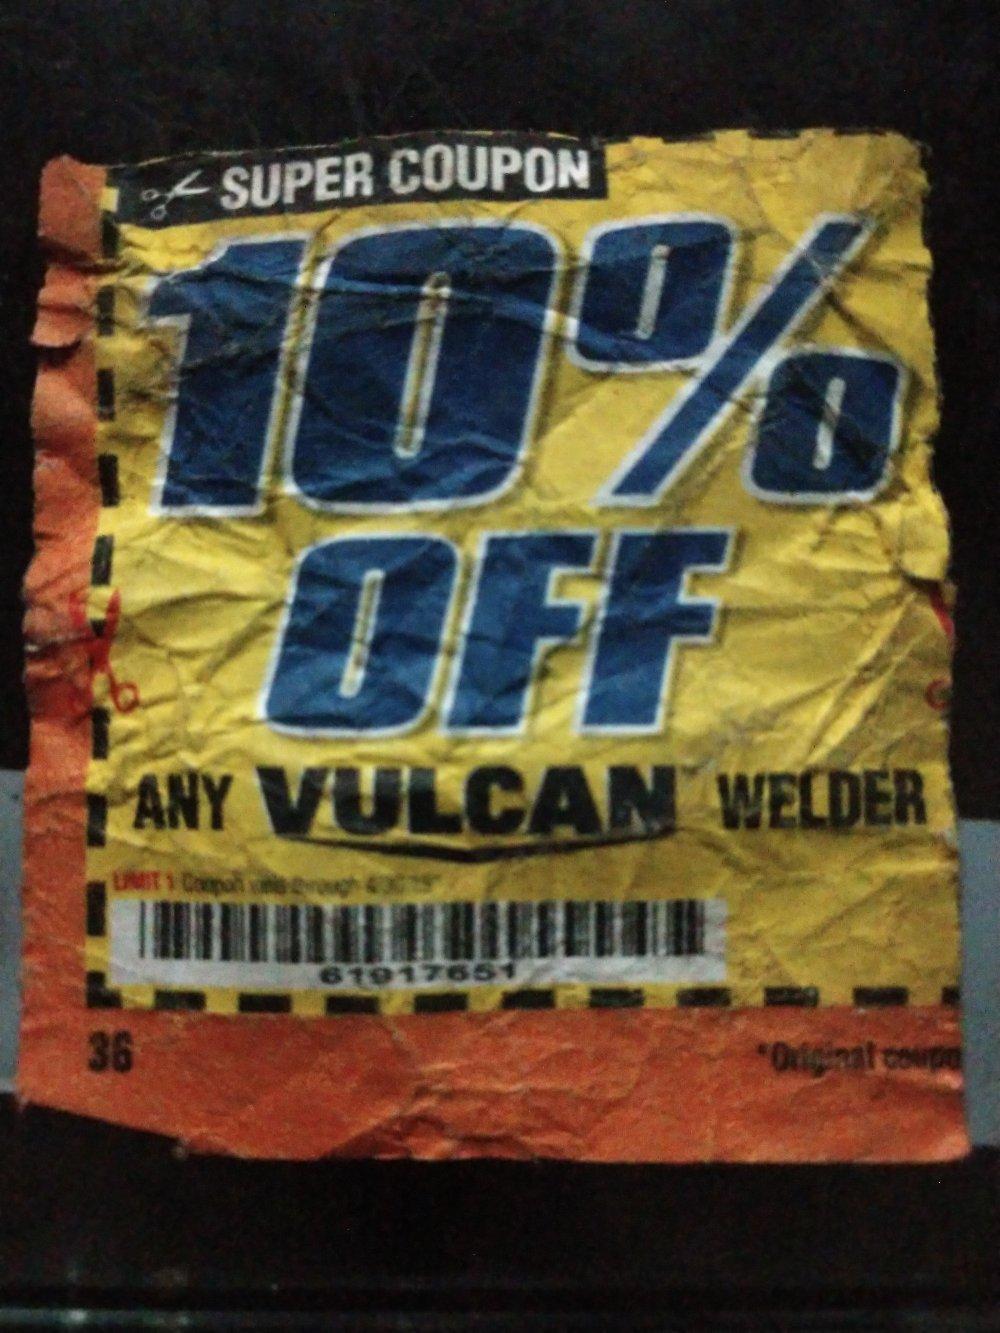 Harbor Freight Coupon, HF Coupons - 10% off Vulcan welder